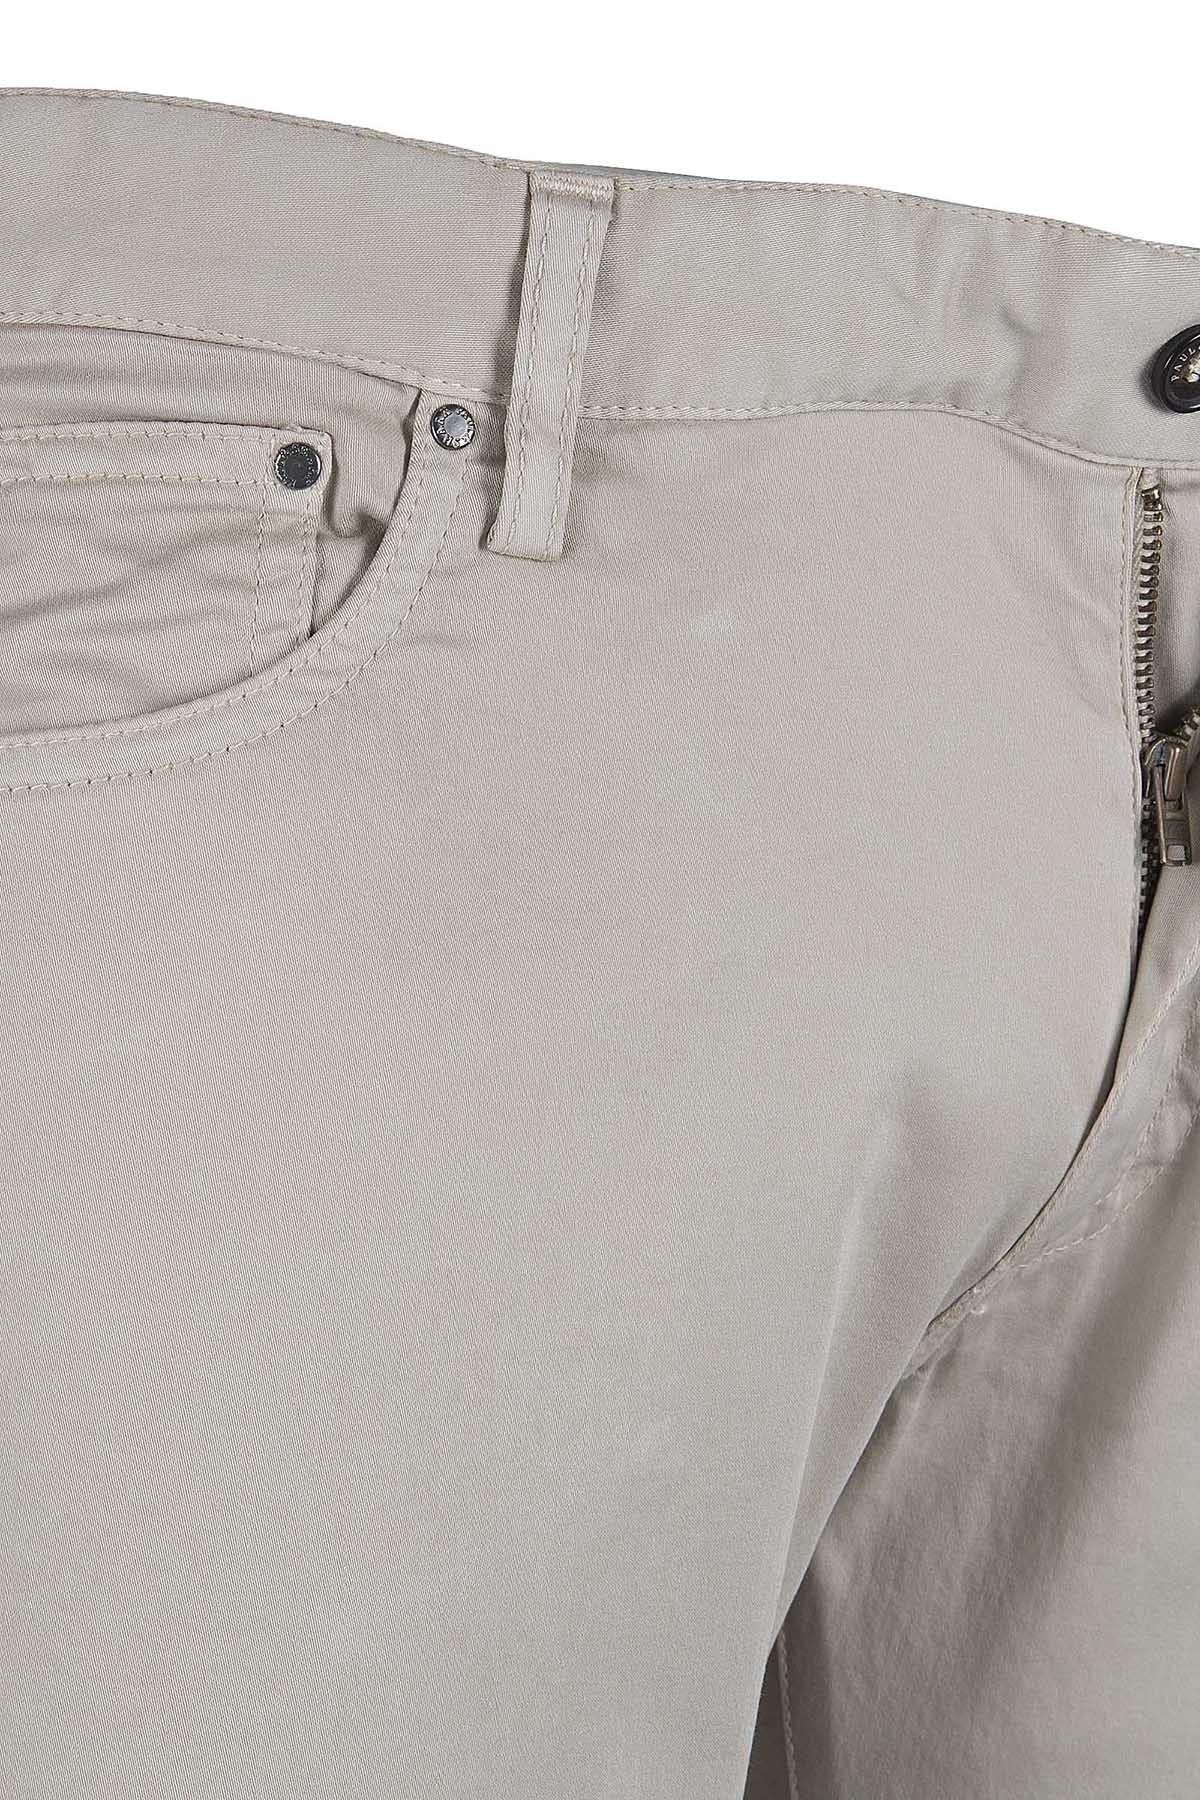 PAUL&SHARK JEANS Erkek Pamuklu Pantolon P18P4131SF 678 BEJ